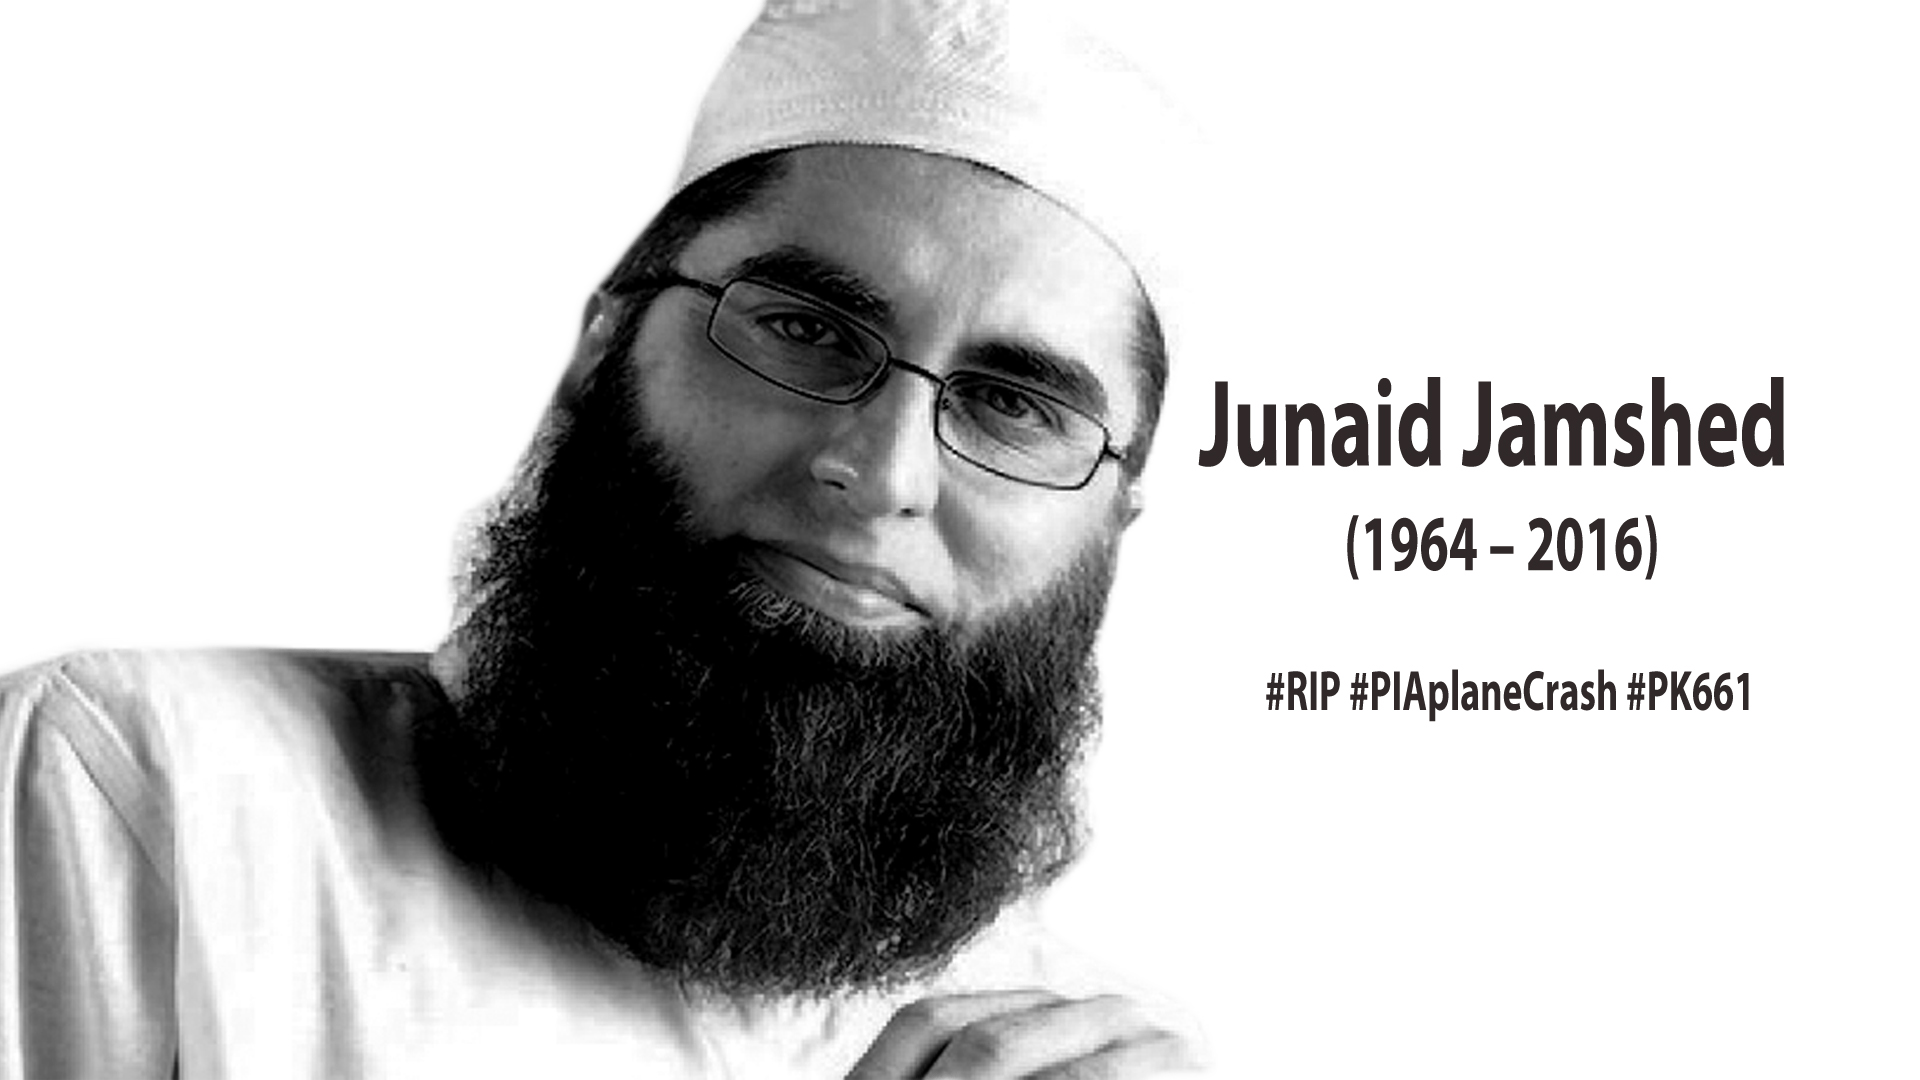 Junaid-Jamshed-2